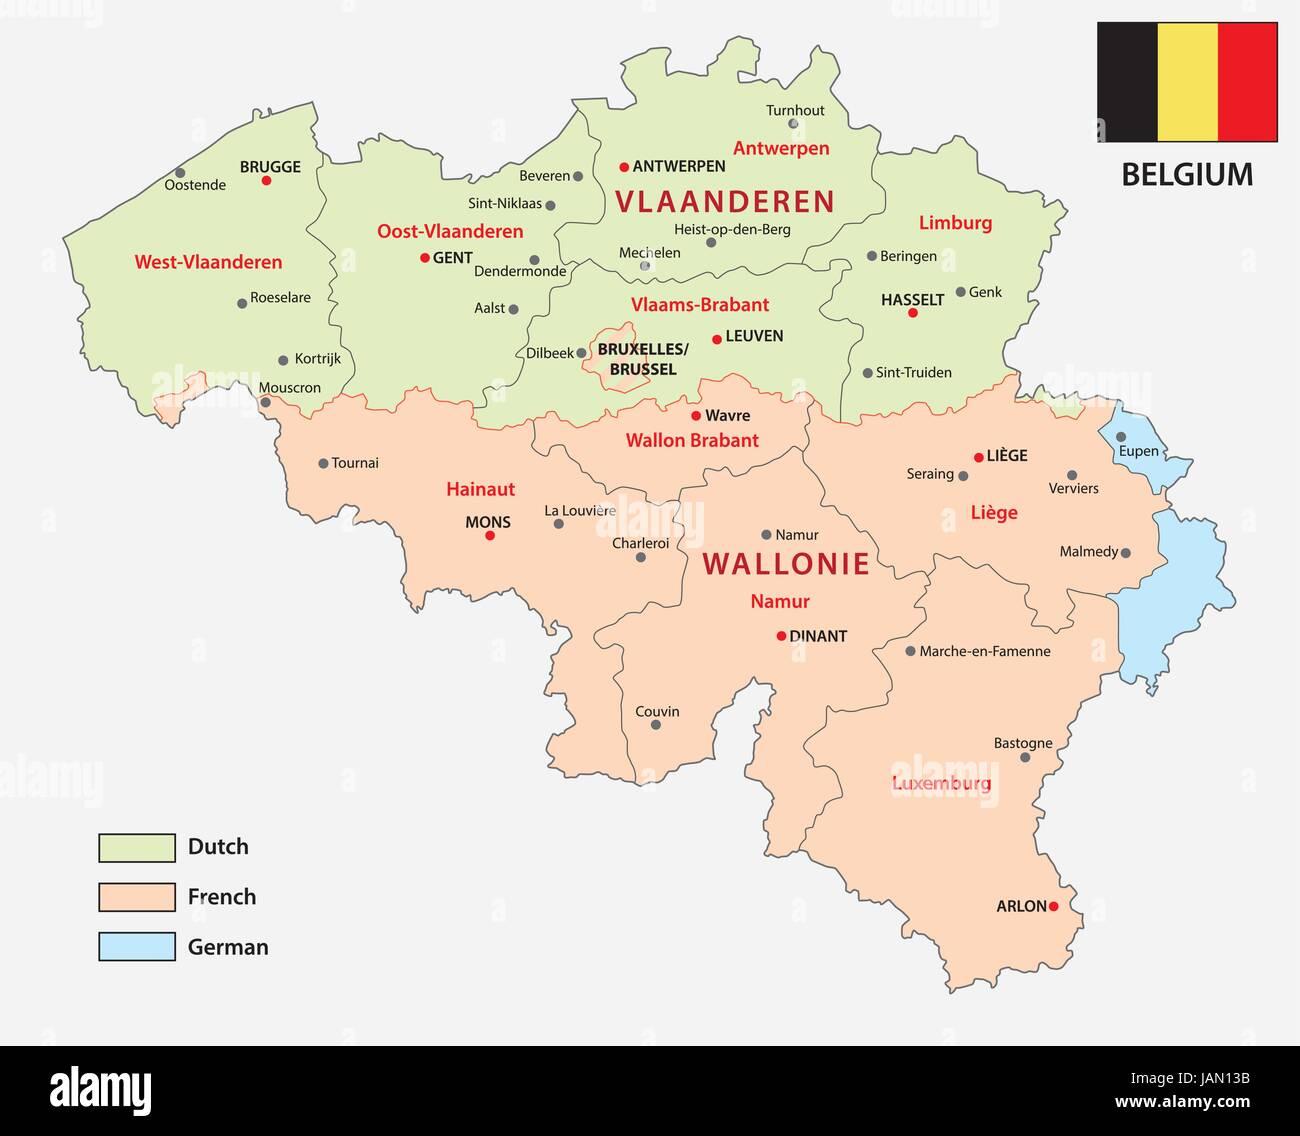 Map Of The Belgian Regions And Language Areas Stock Vector Art - Belgium regions map